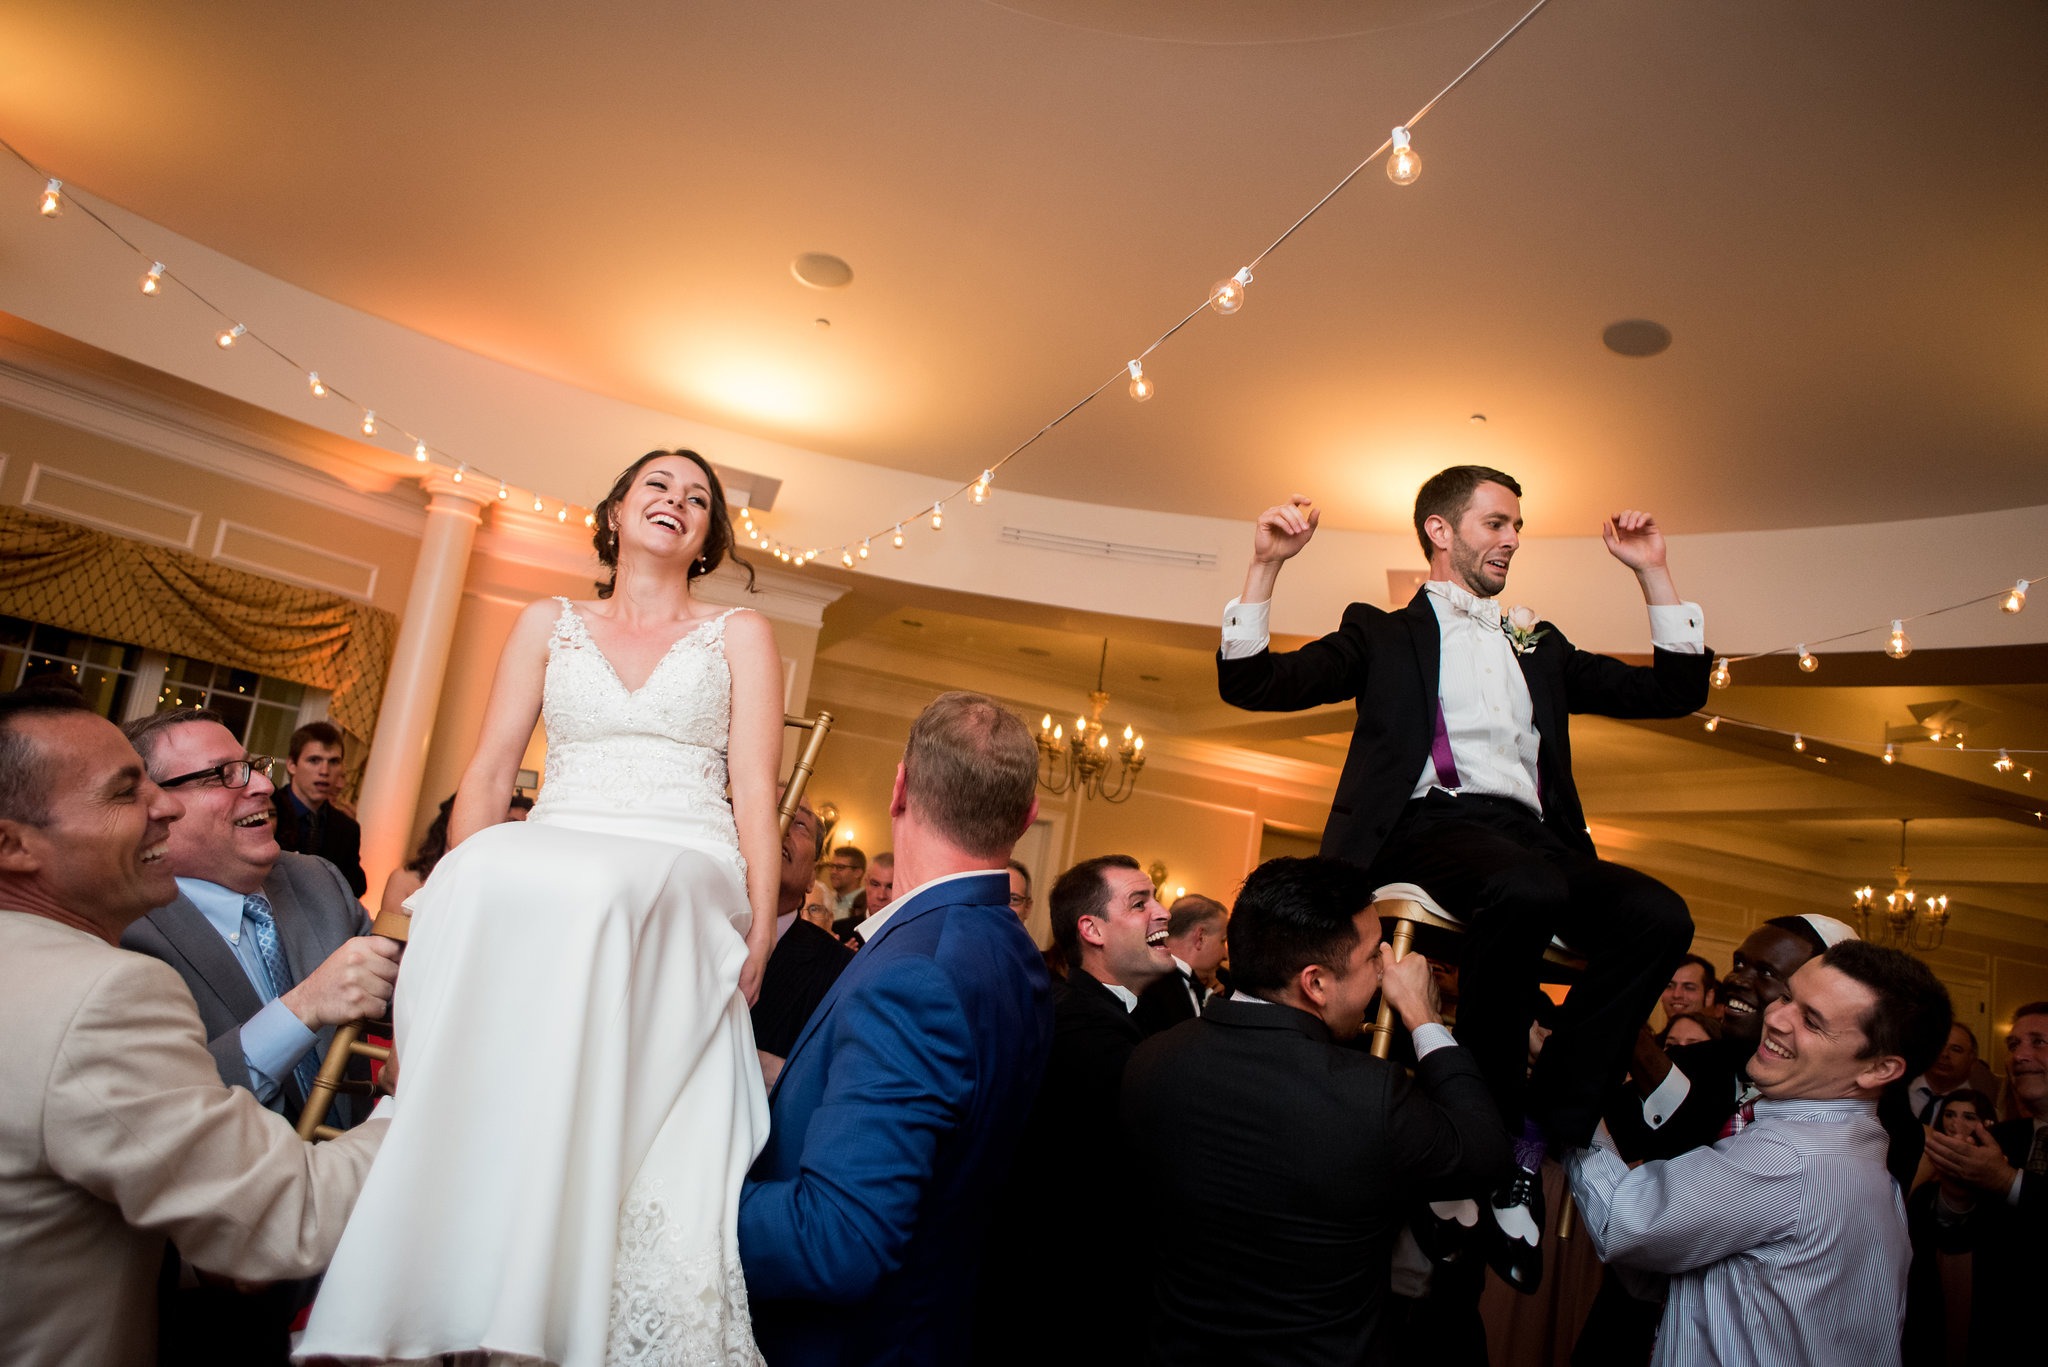 st-augustine-wedding-photographer-sarah-annay-photography.jpg76.jpg